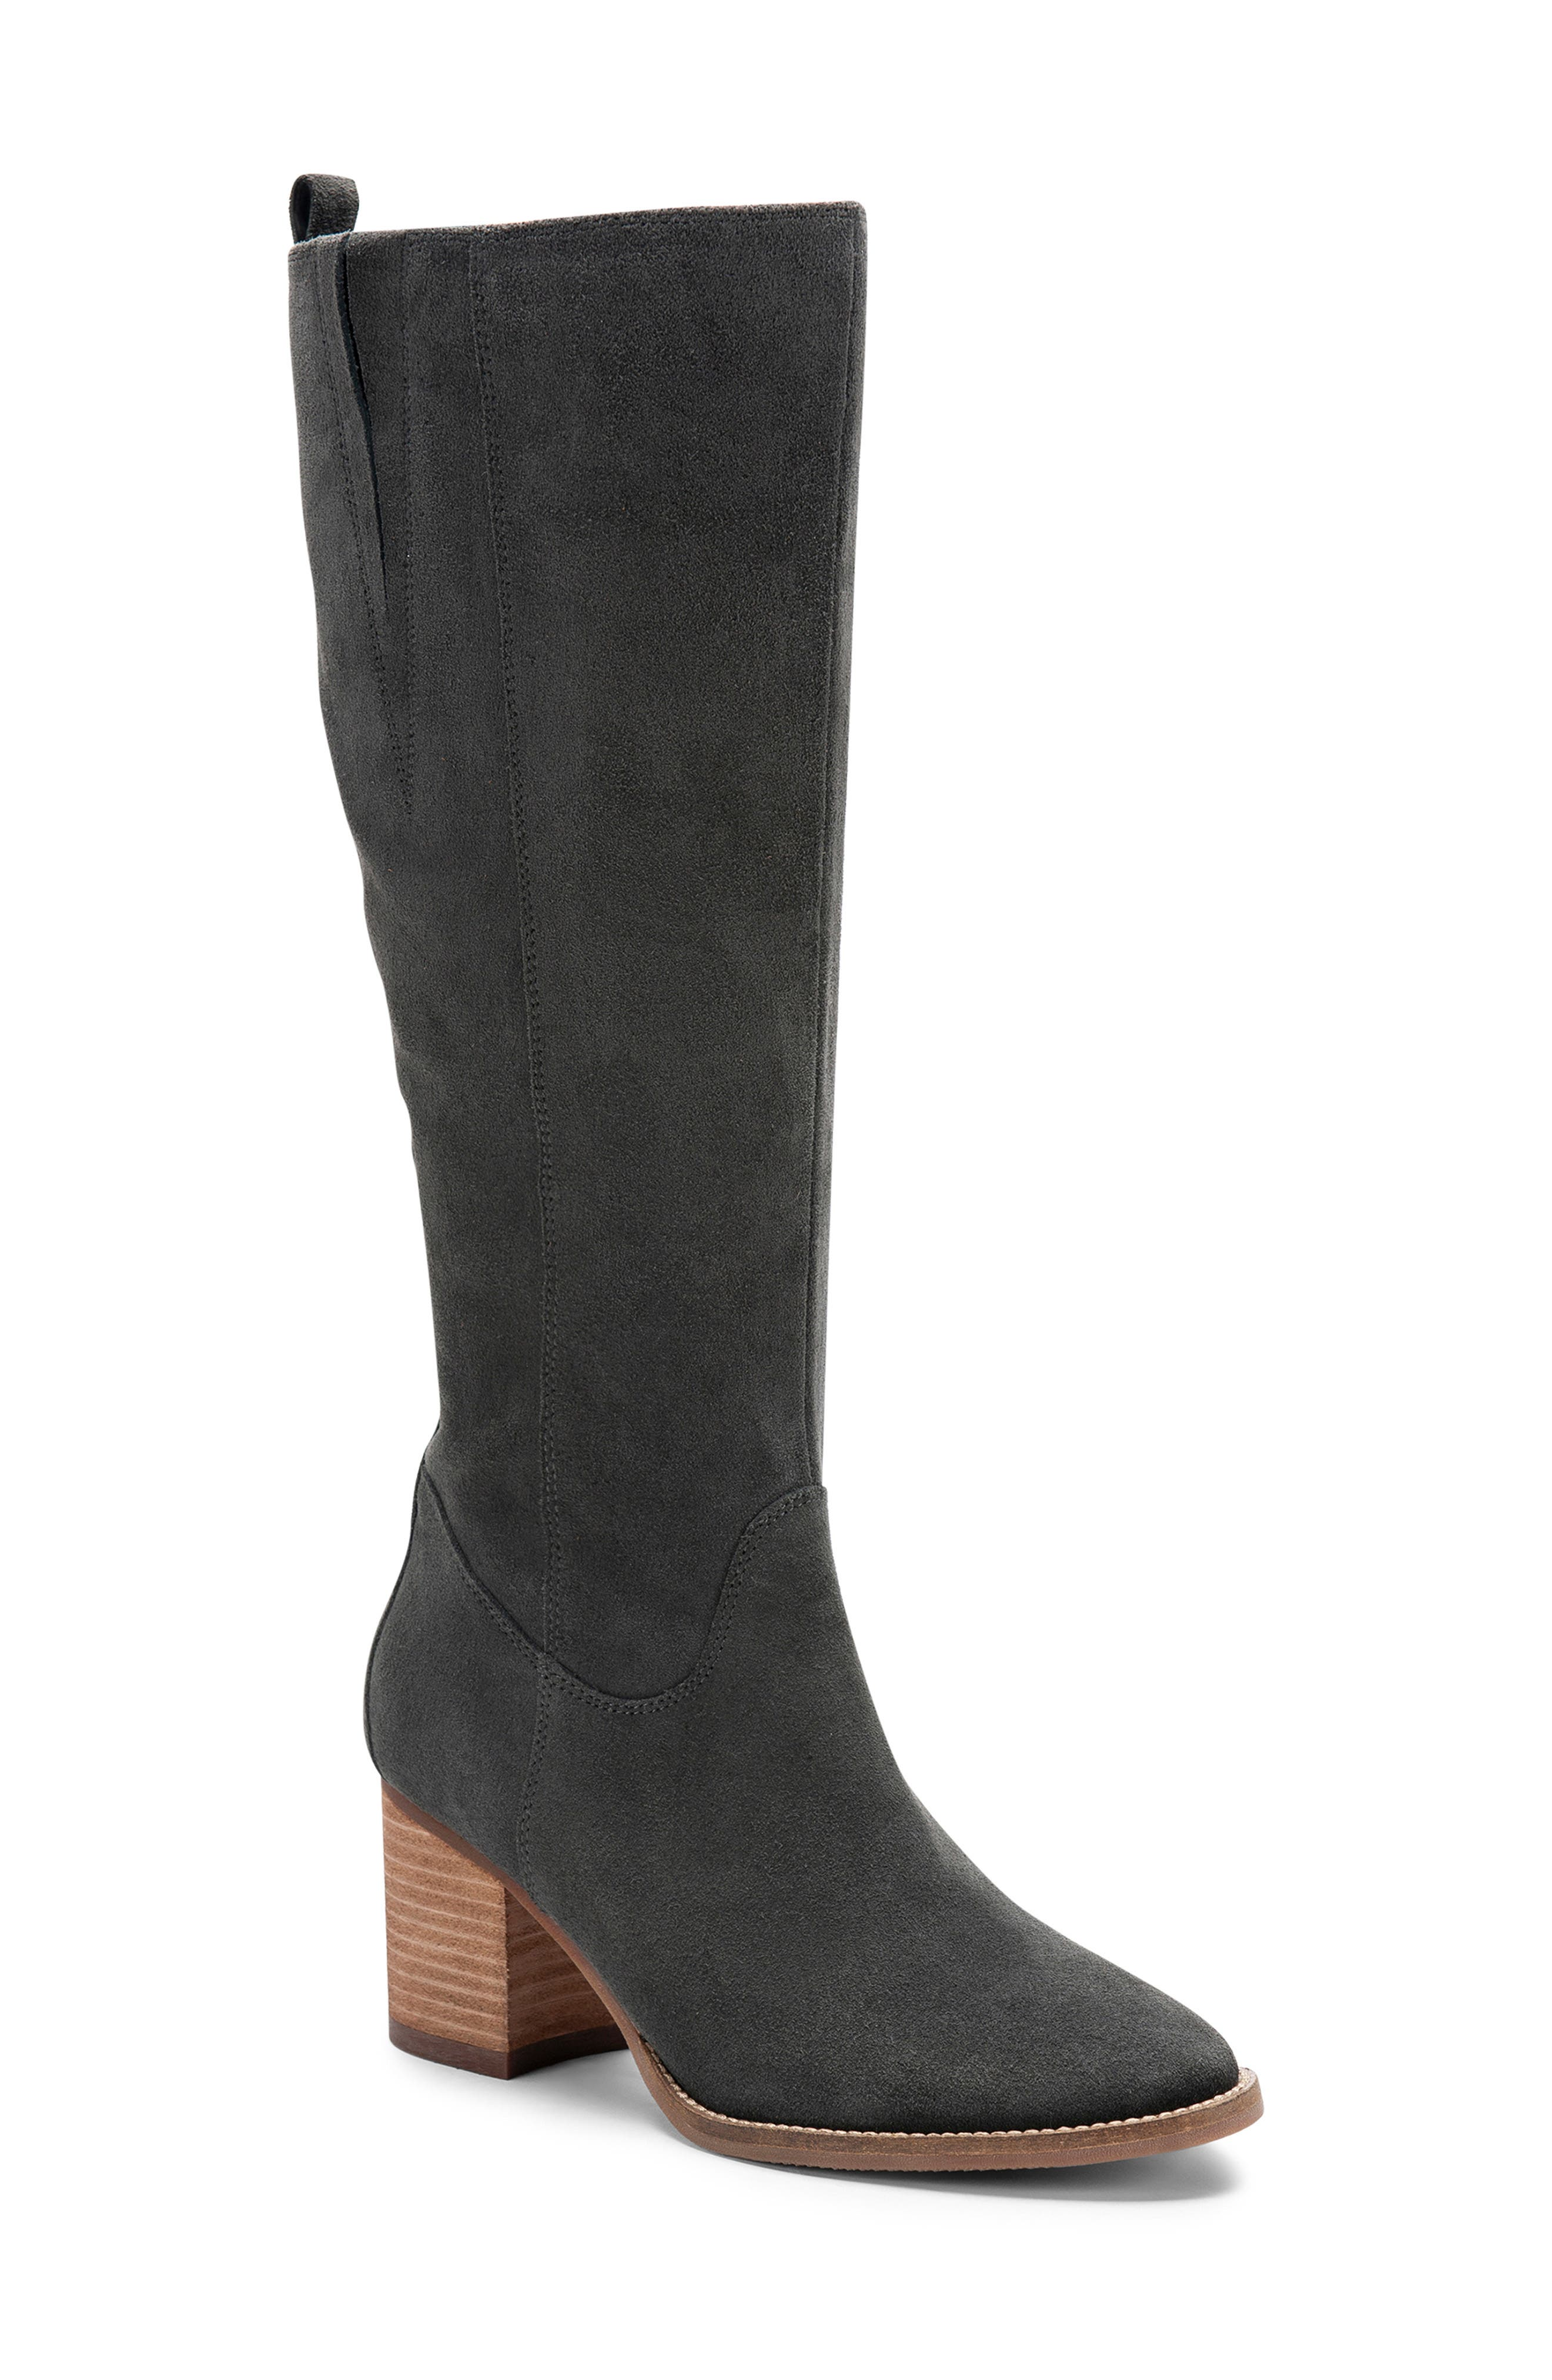 Blondo Nikki Waterproof Knee High Waterproof Boot (Women)